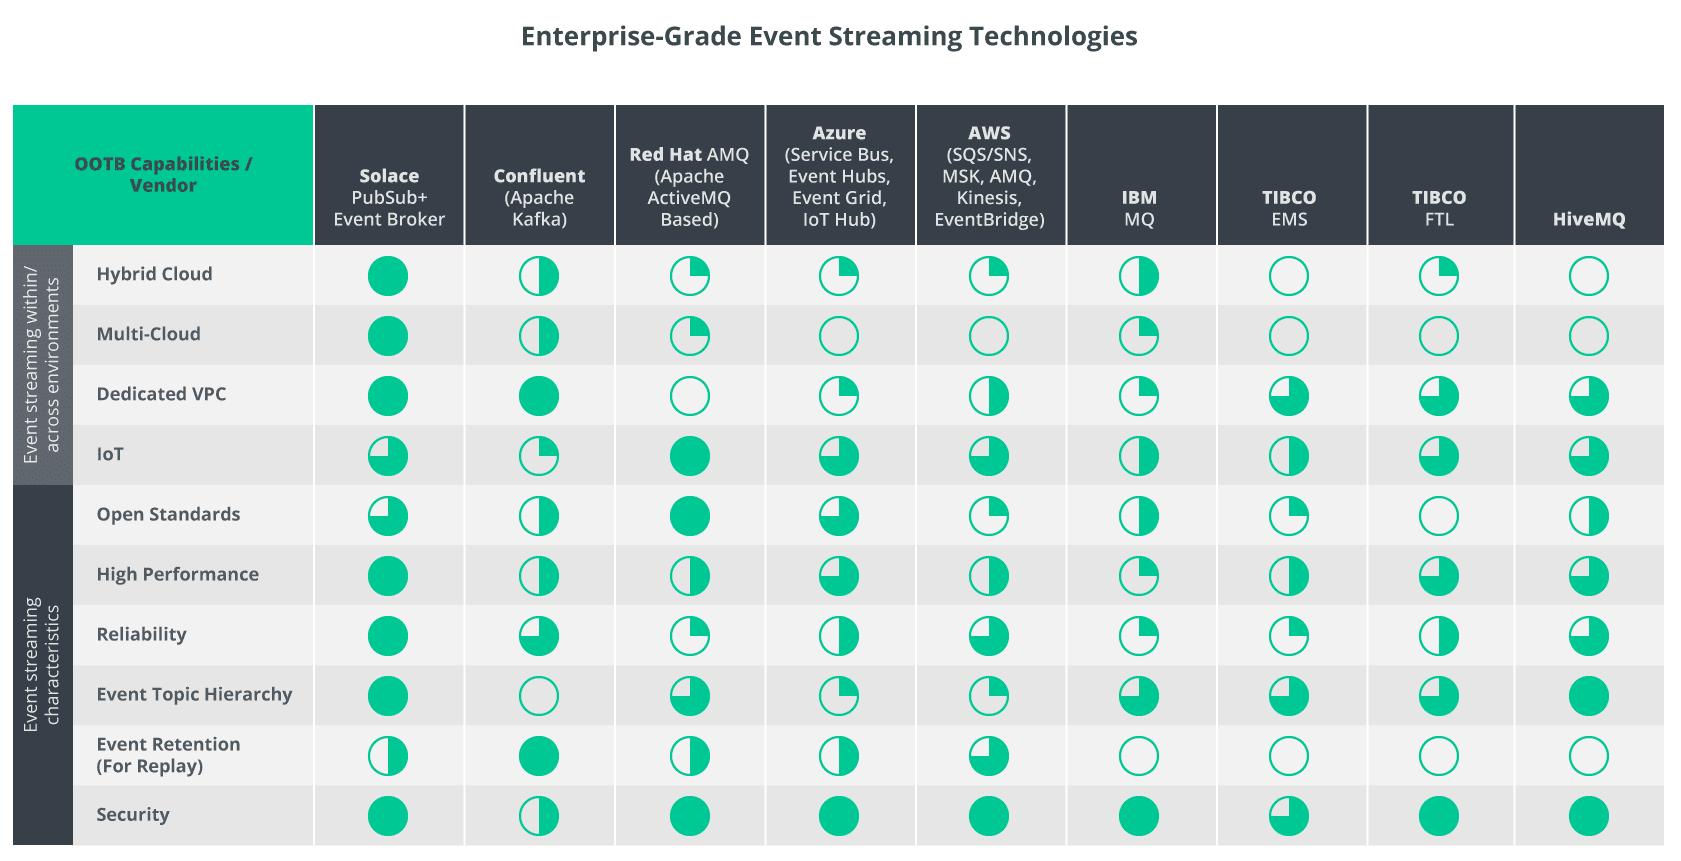 enterprise-grade event streaming platforms and technologies comparison chart